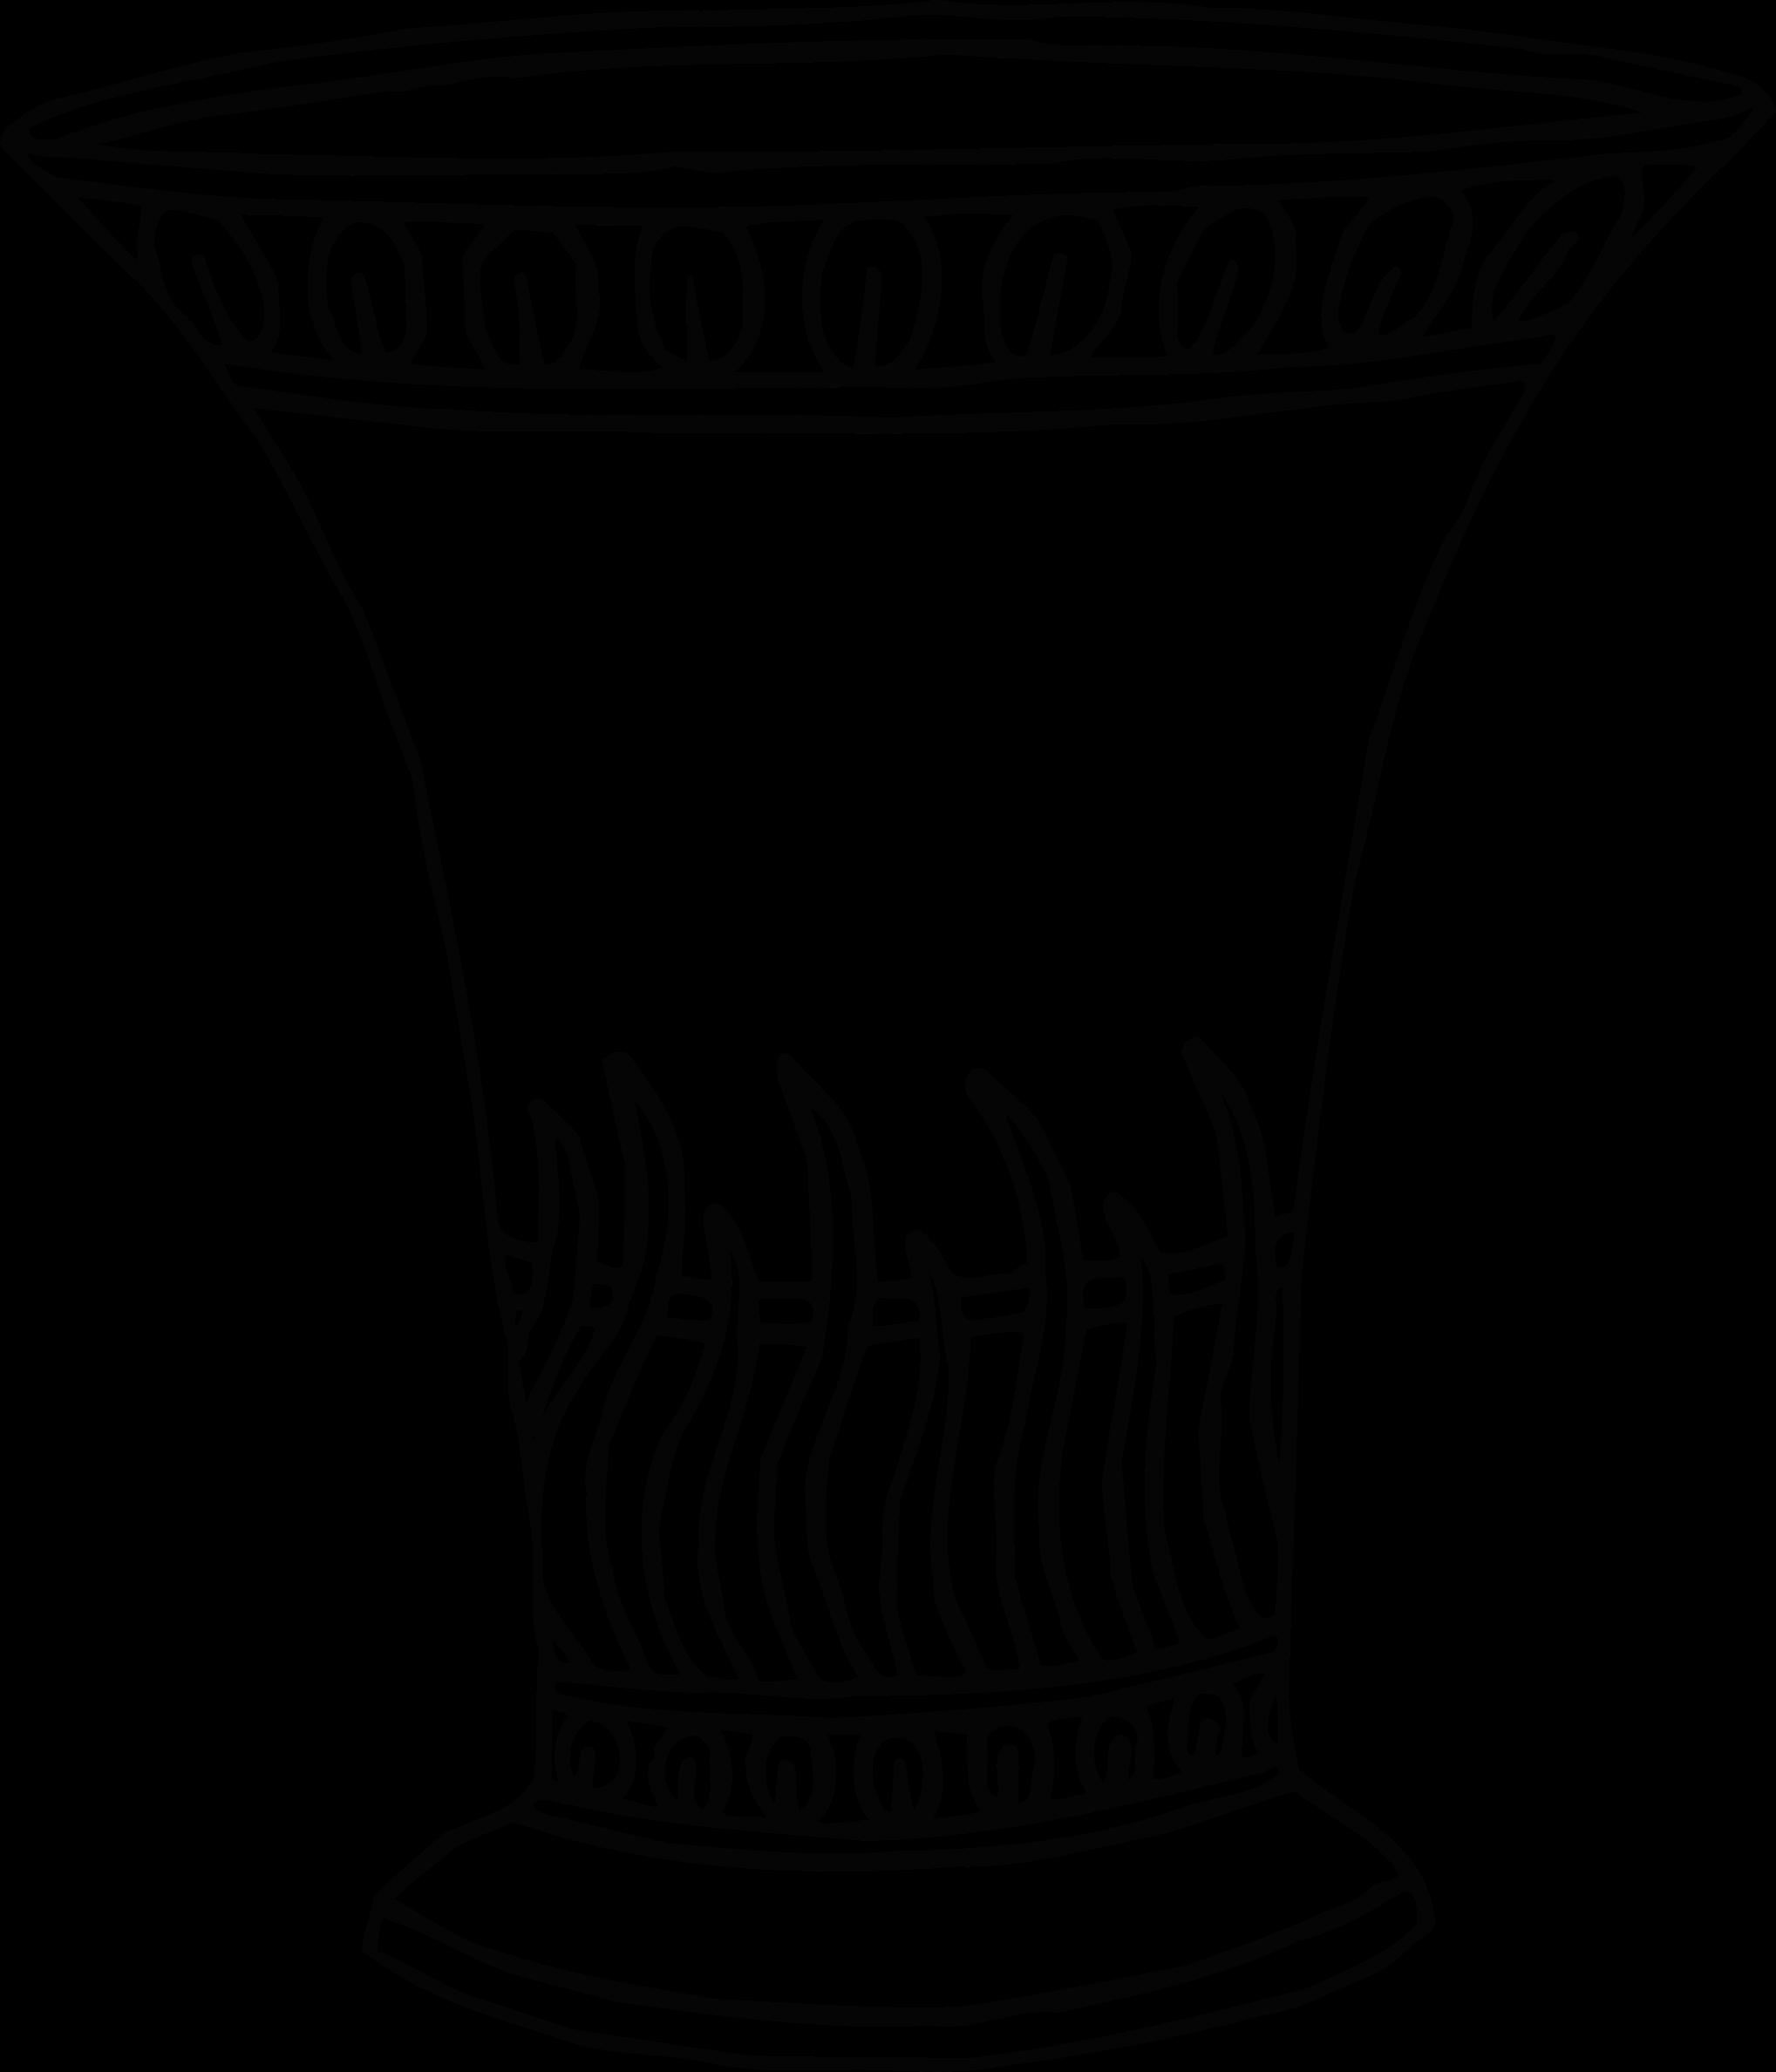 image transparent library Vase Drawing at GetDrawings